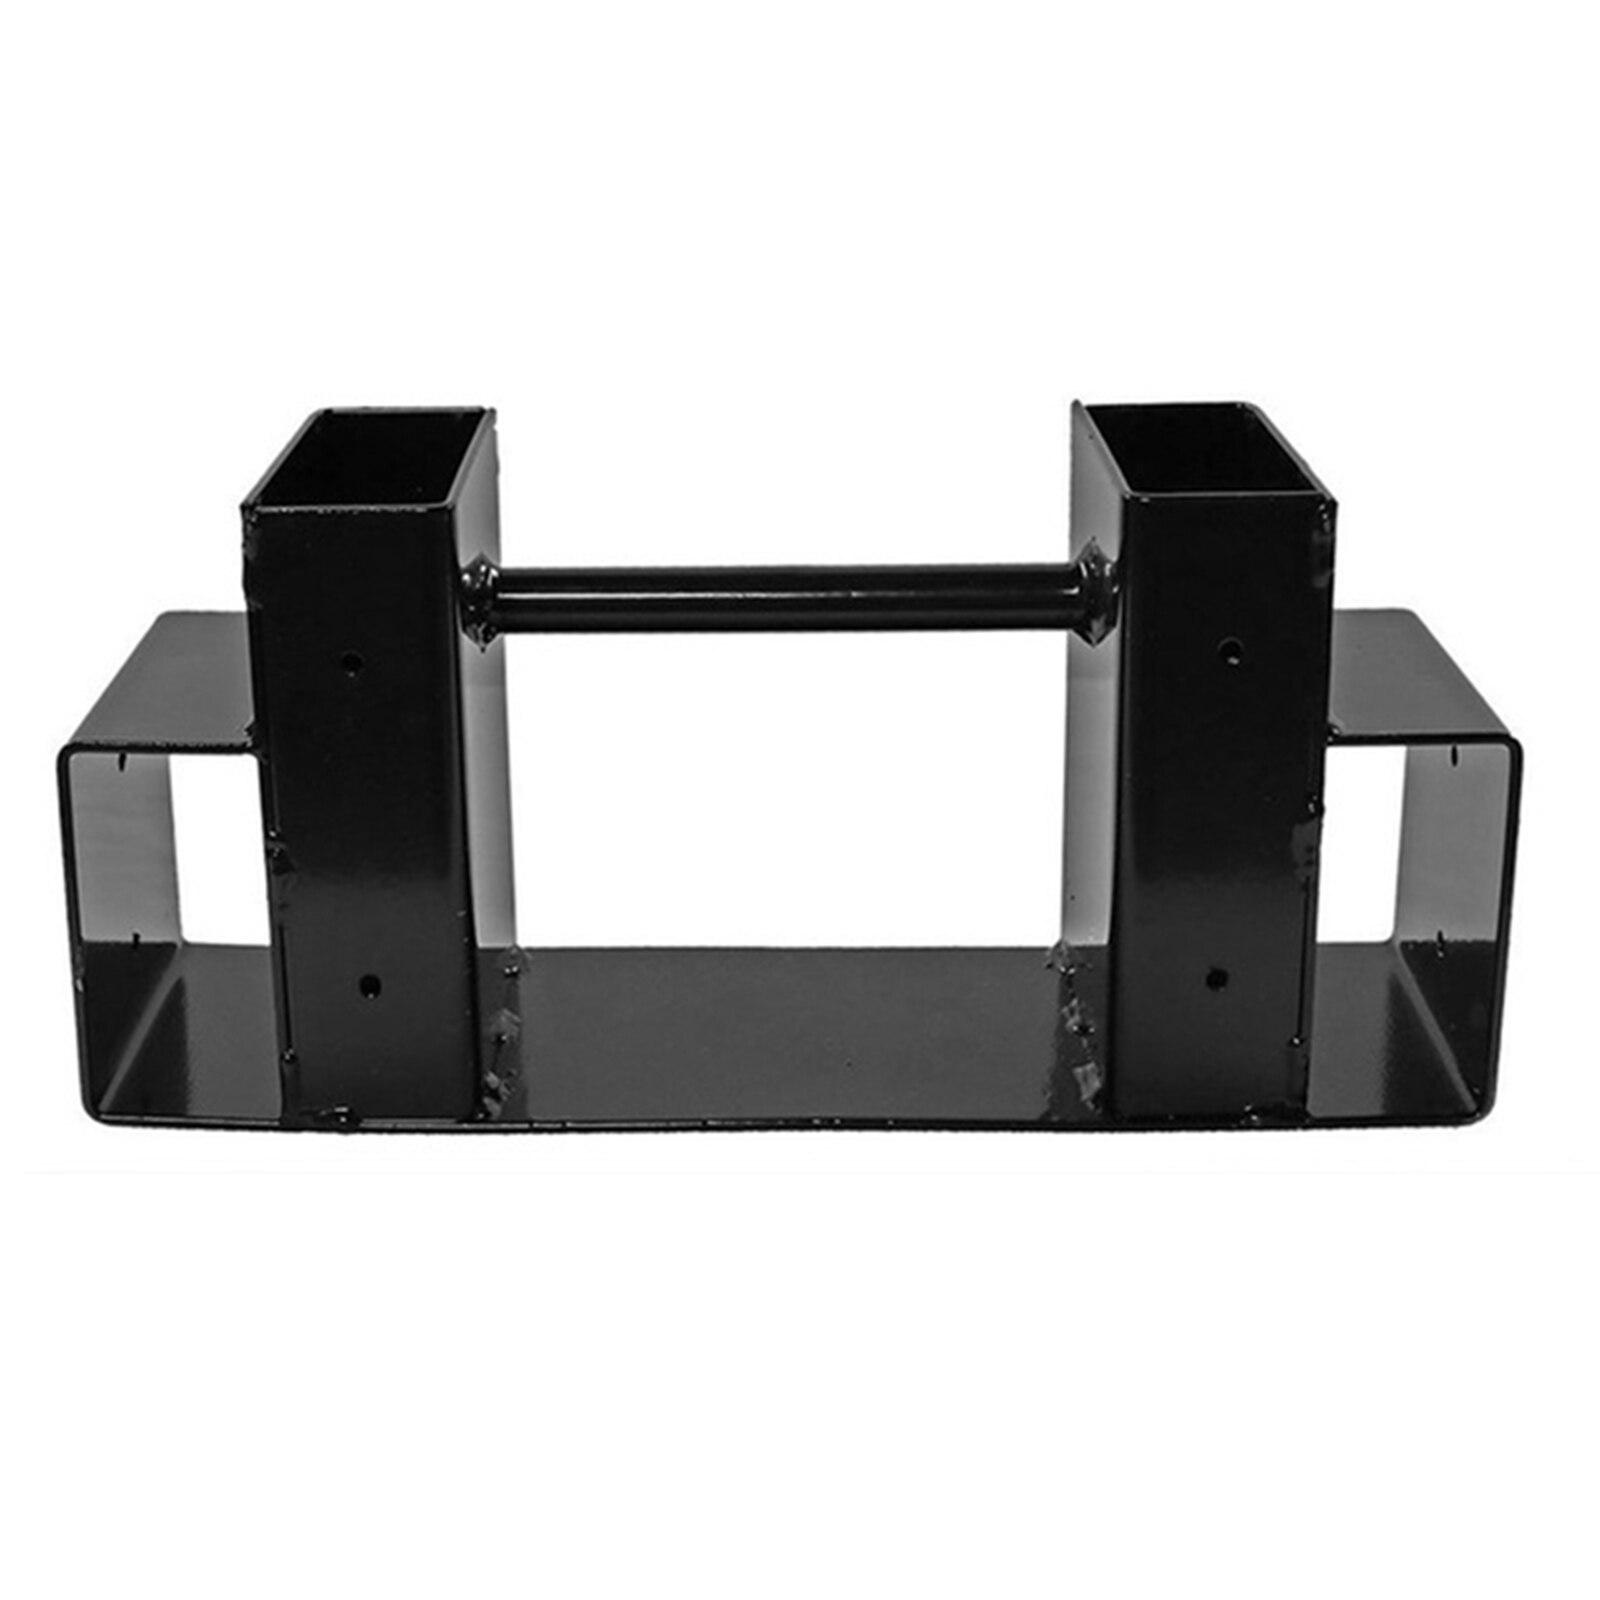 Firewood Log Storage Rack Bracket Kit with Screws Fireplace Wood Storage Holder Adjustable for Indoor/Outdoor Black TB Sale